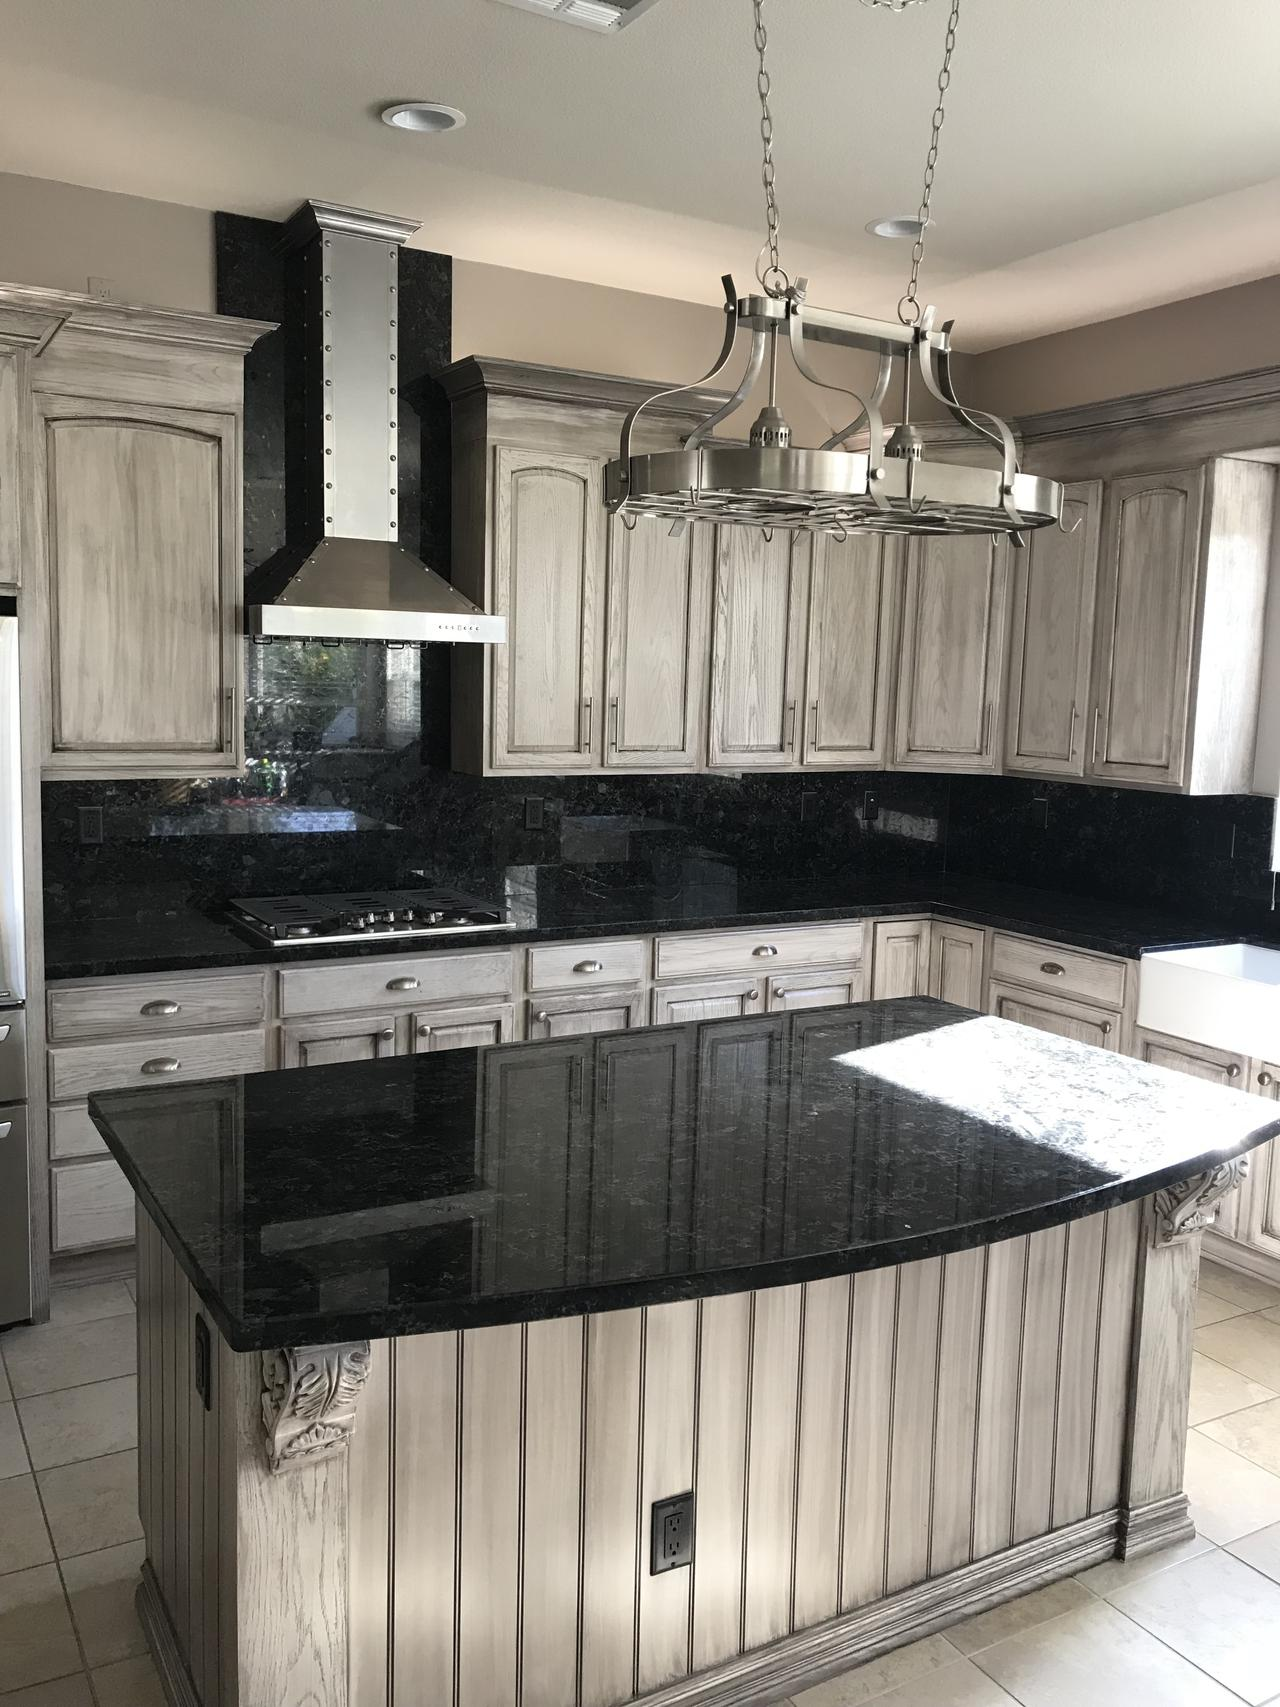 website-review-images/Kitchen Remodel 1.jpeg